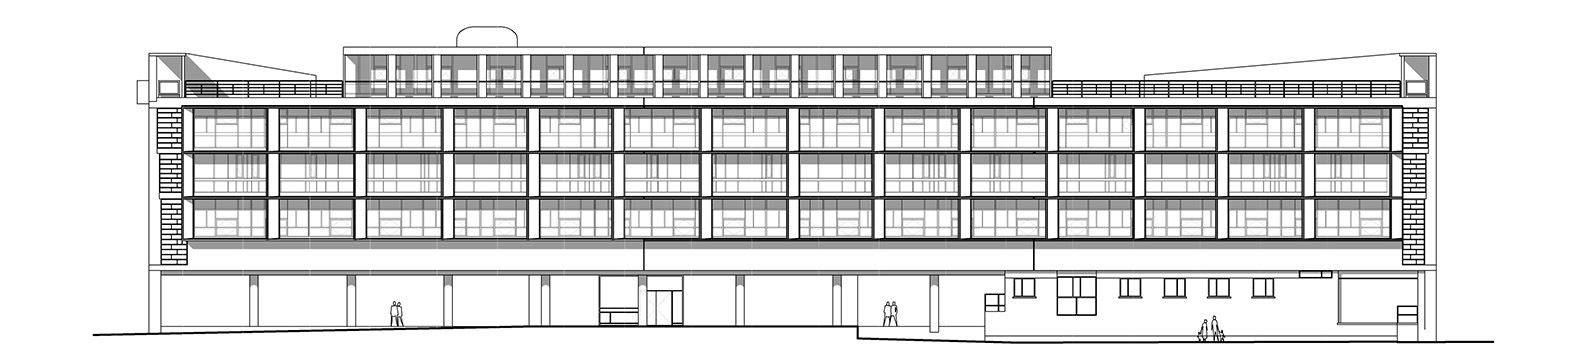 http://studiolada.fr/files/gimgs/203_duval-facade.jpg